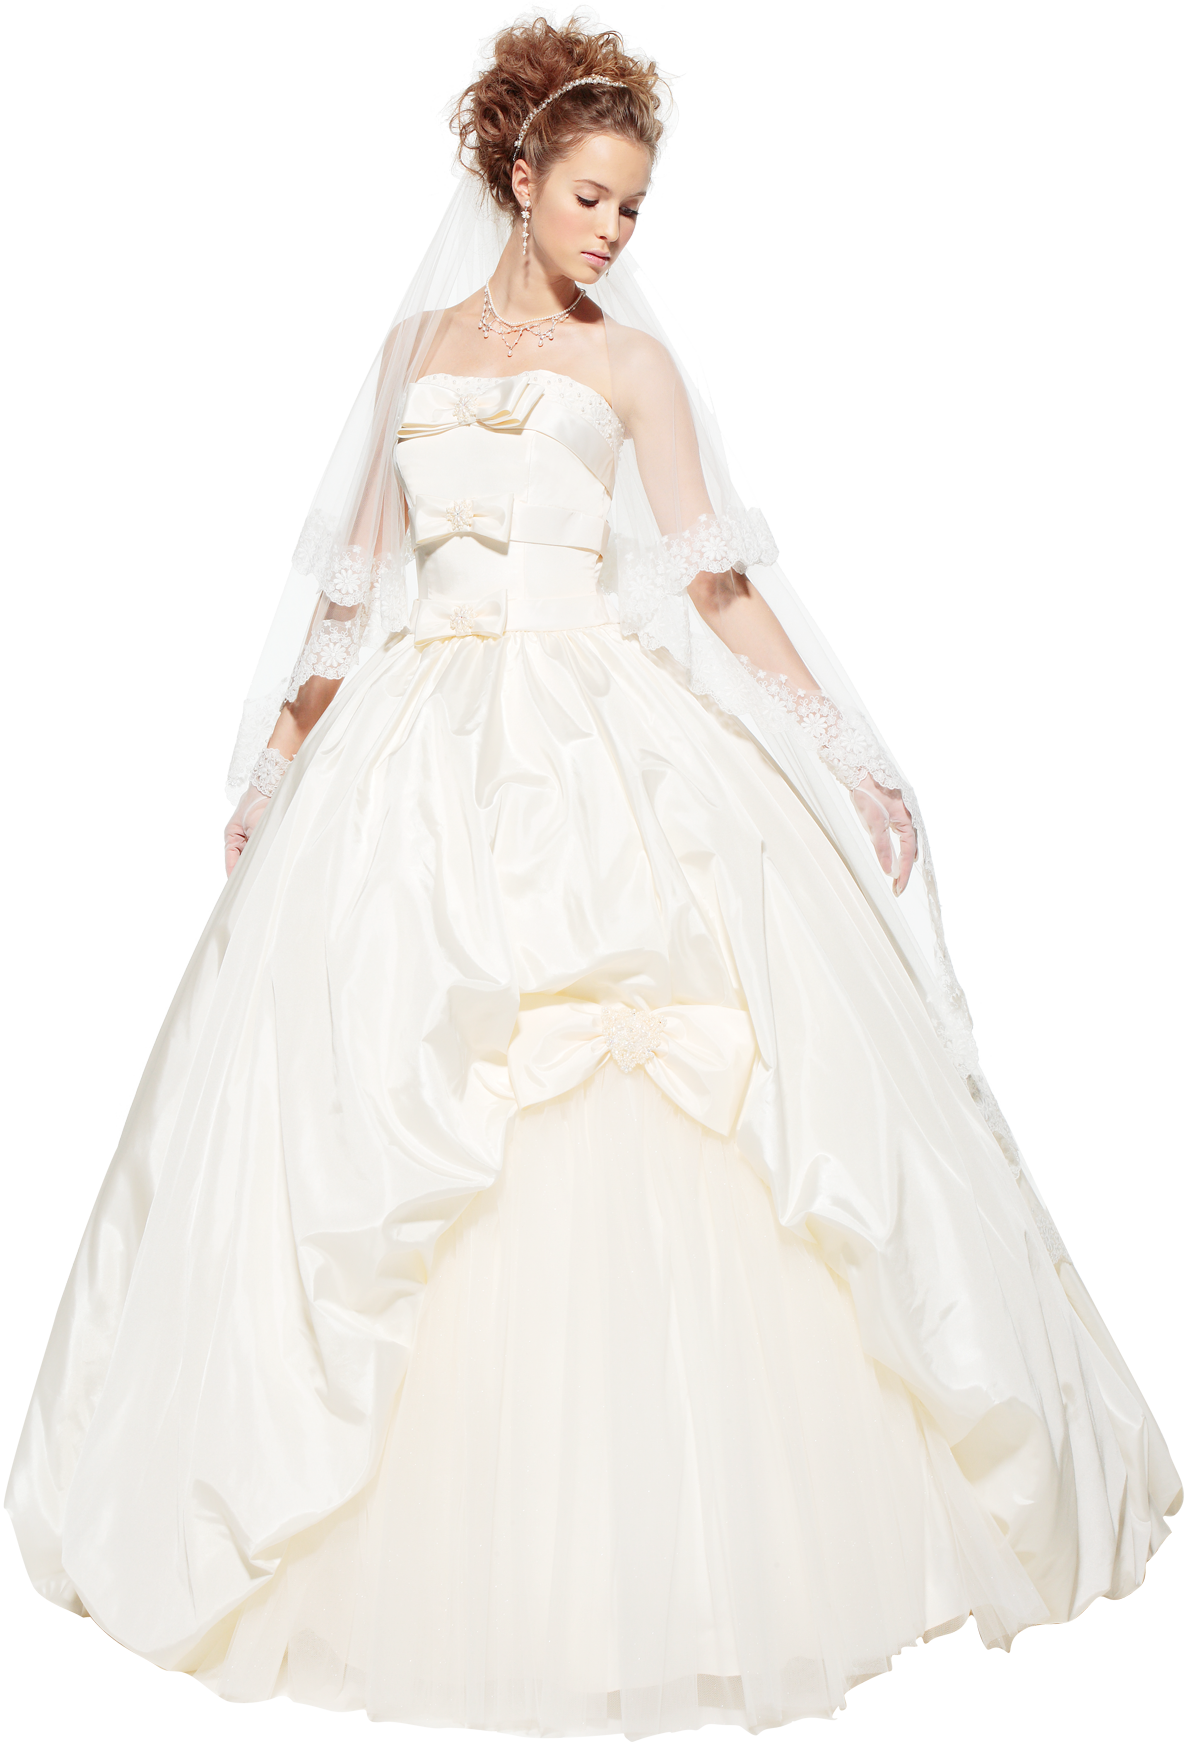 Bride PNG - 36141